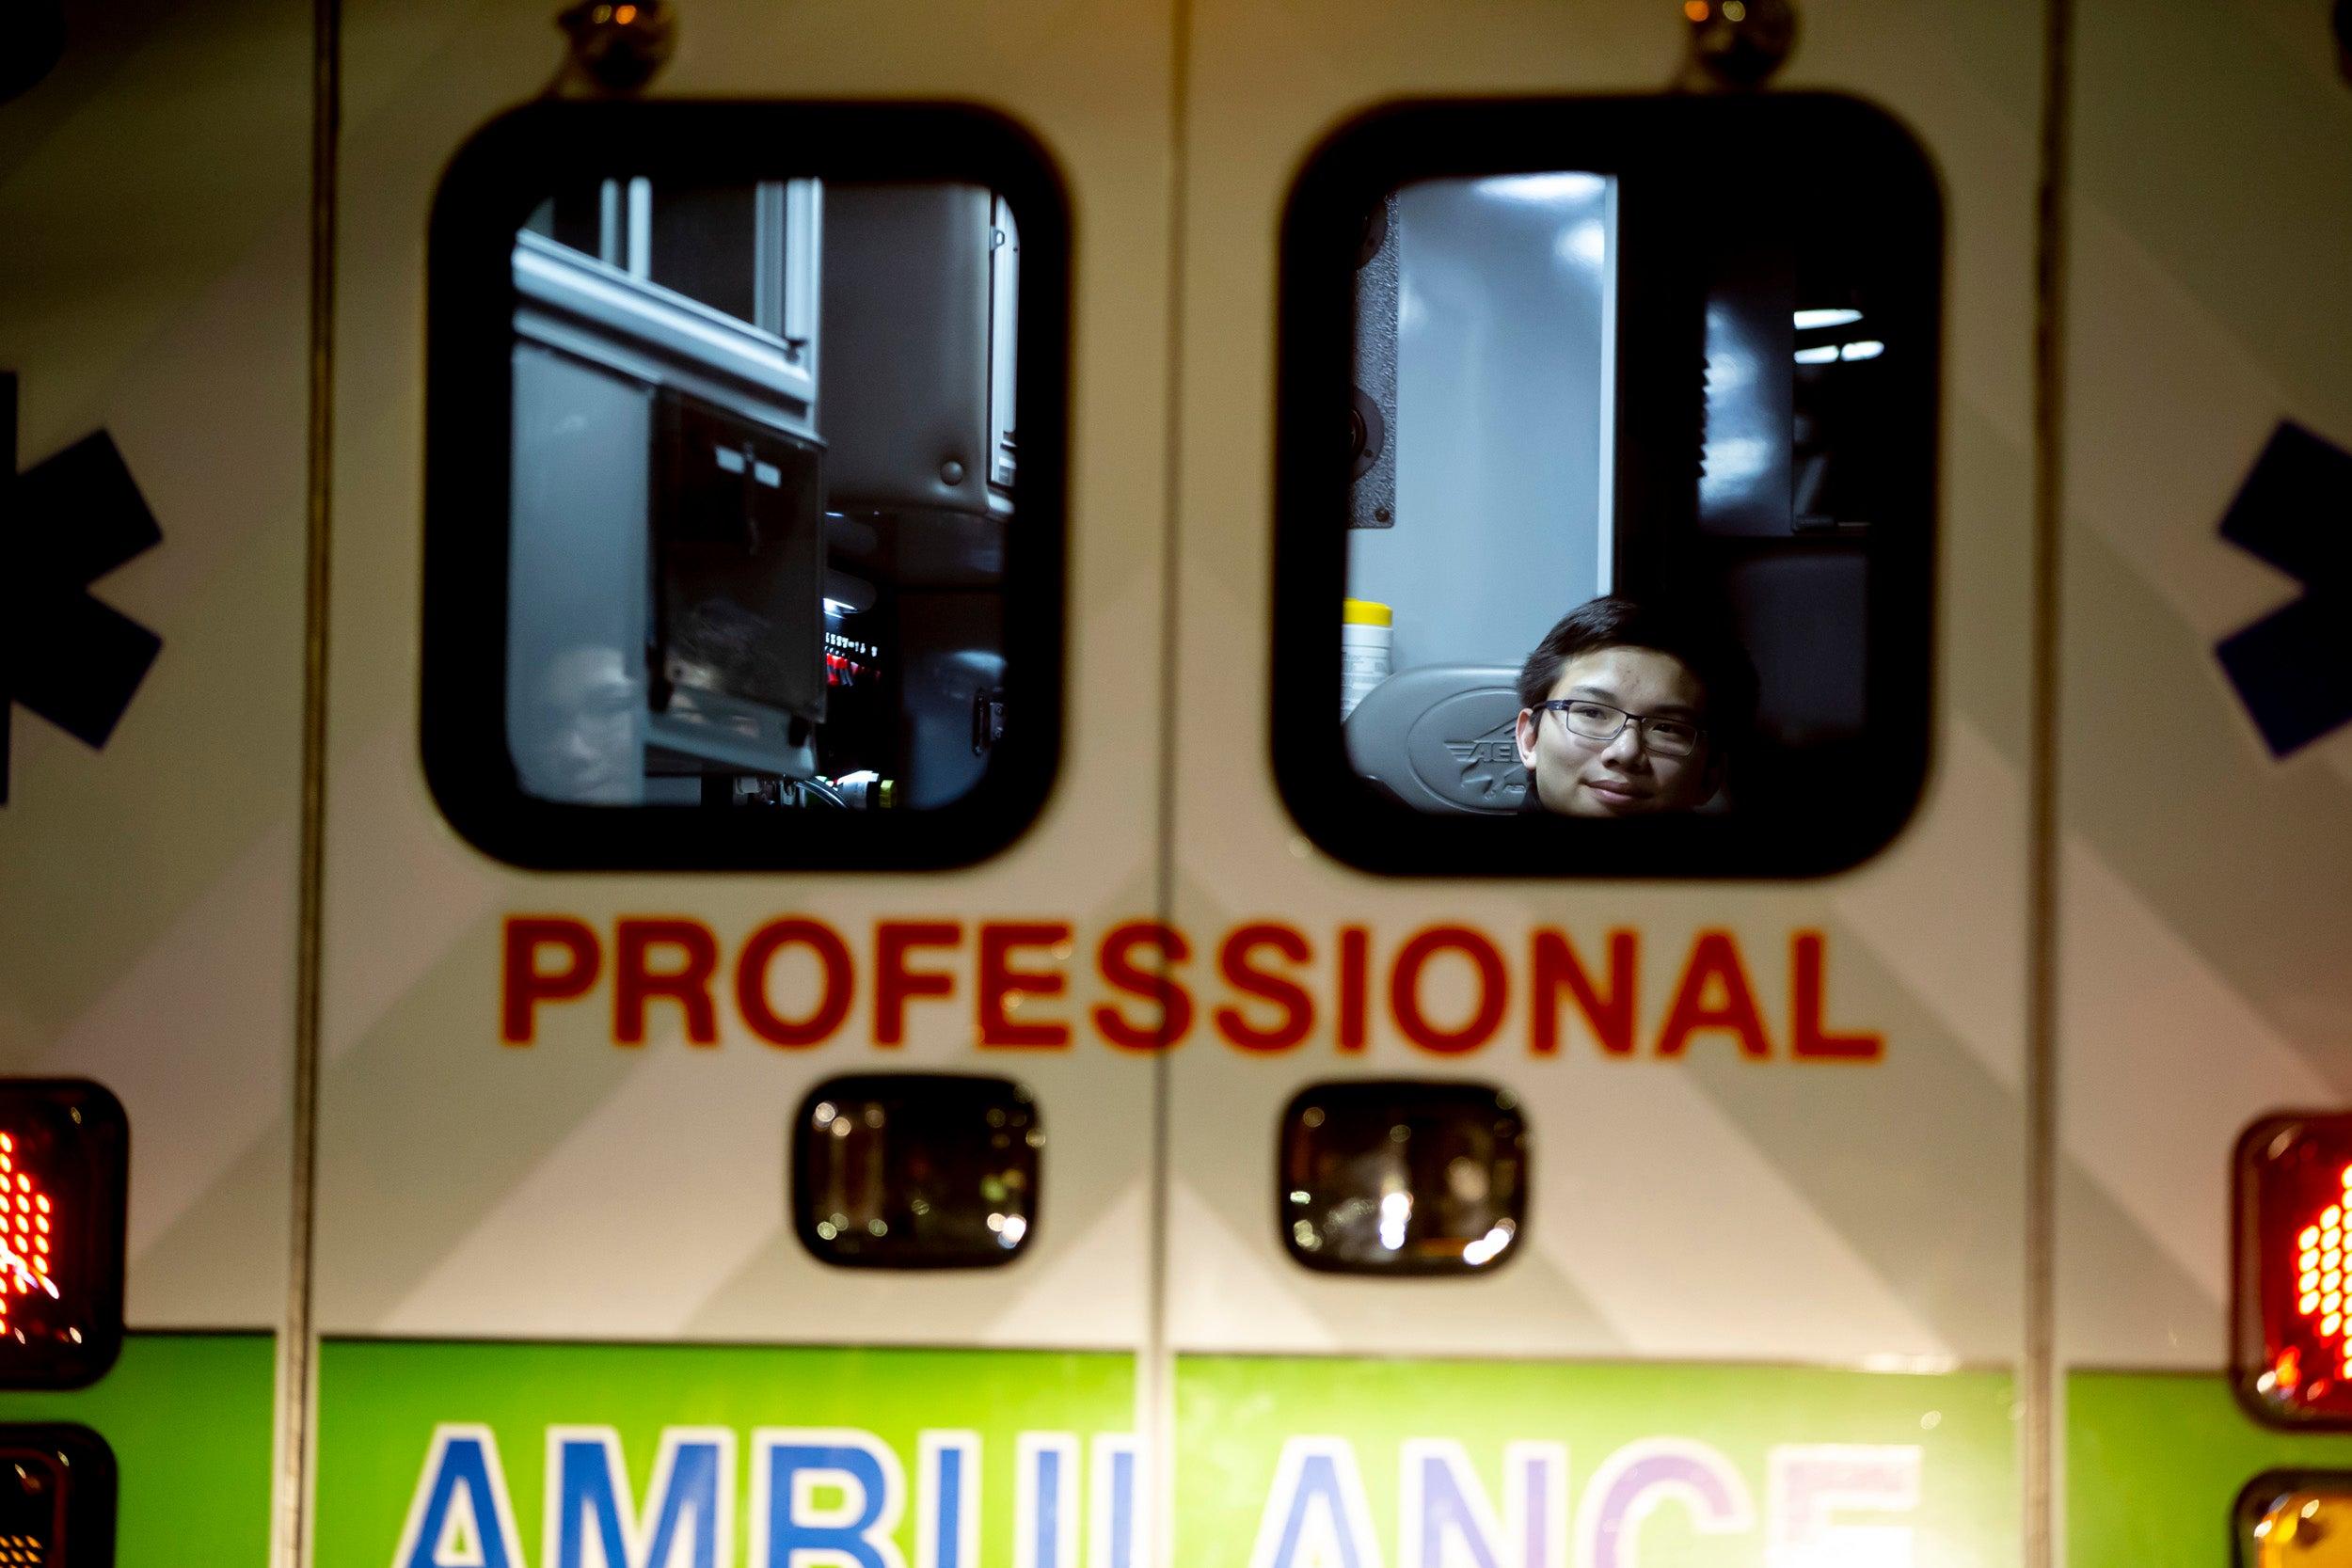 Benjamin Ho is seen through the back door of an ambulance.